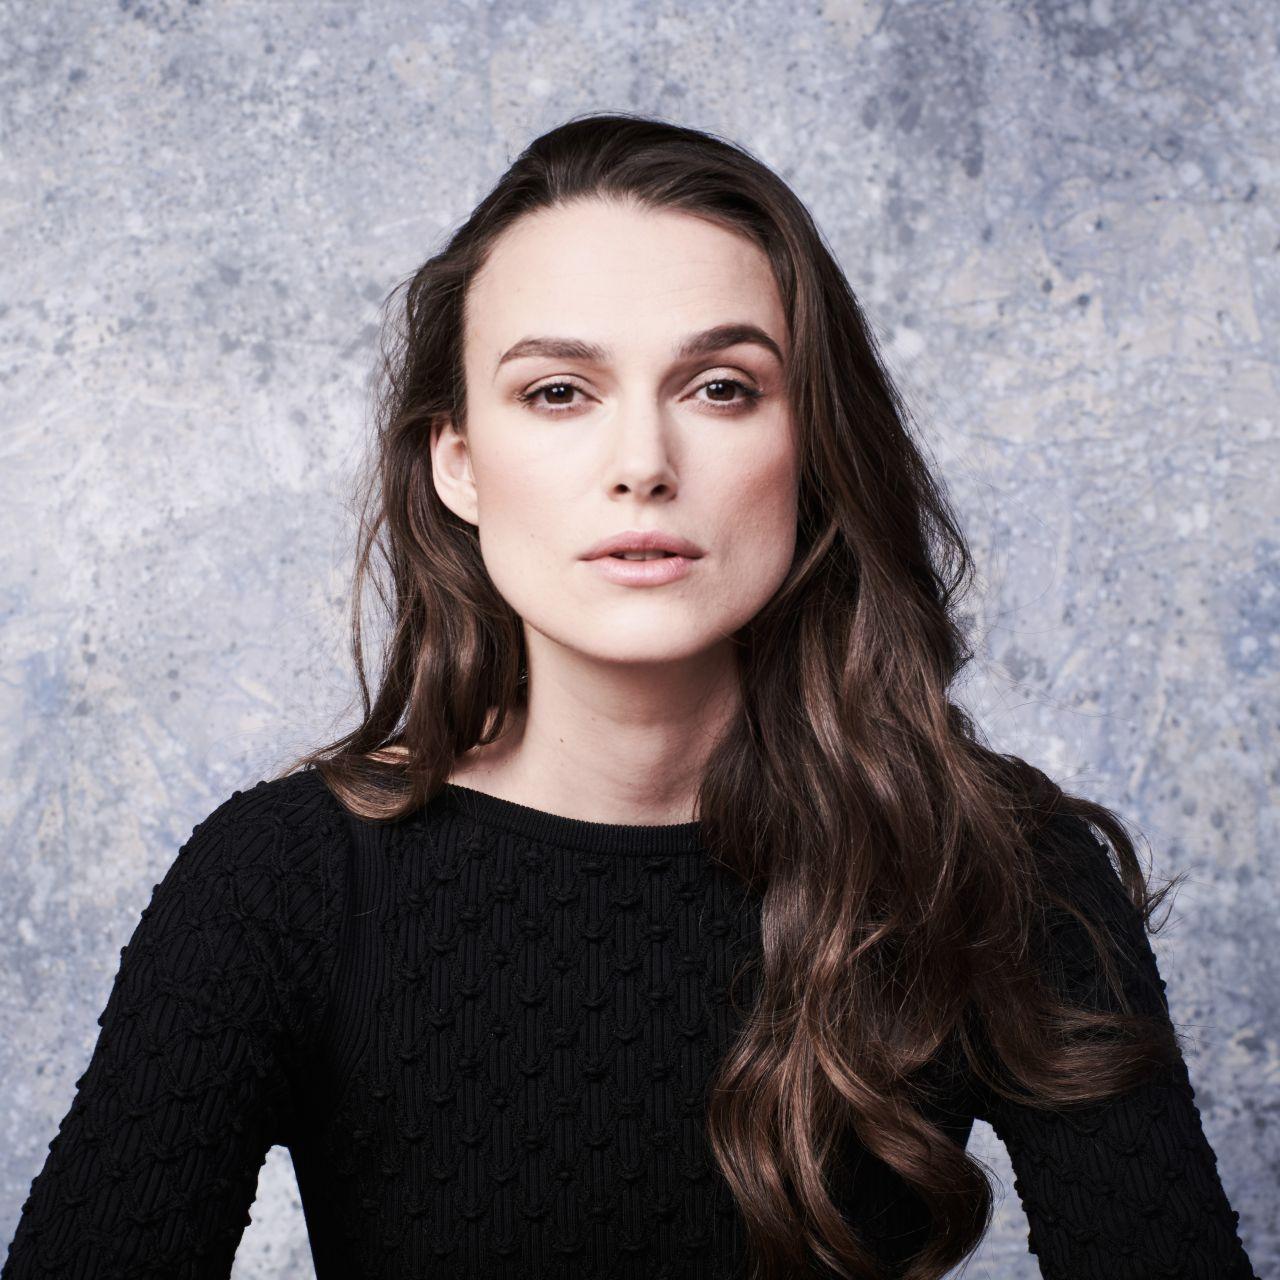 Keira Knightley Deadline Studio Portraits At Sundance 2018